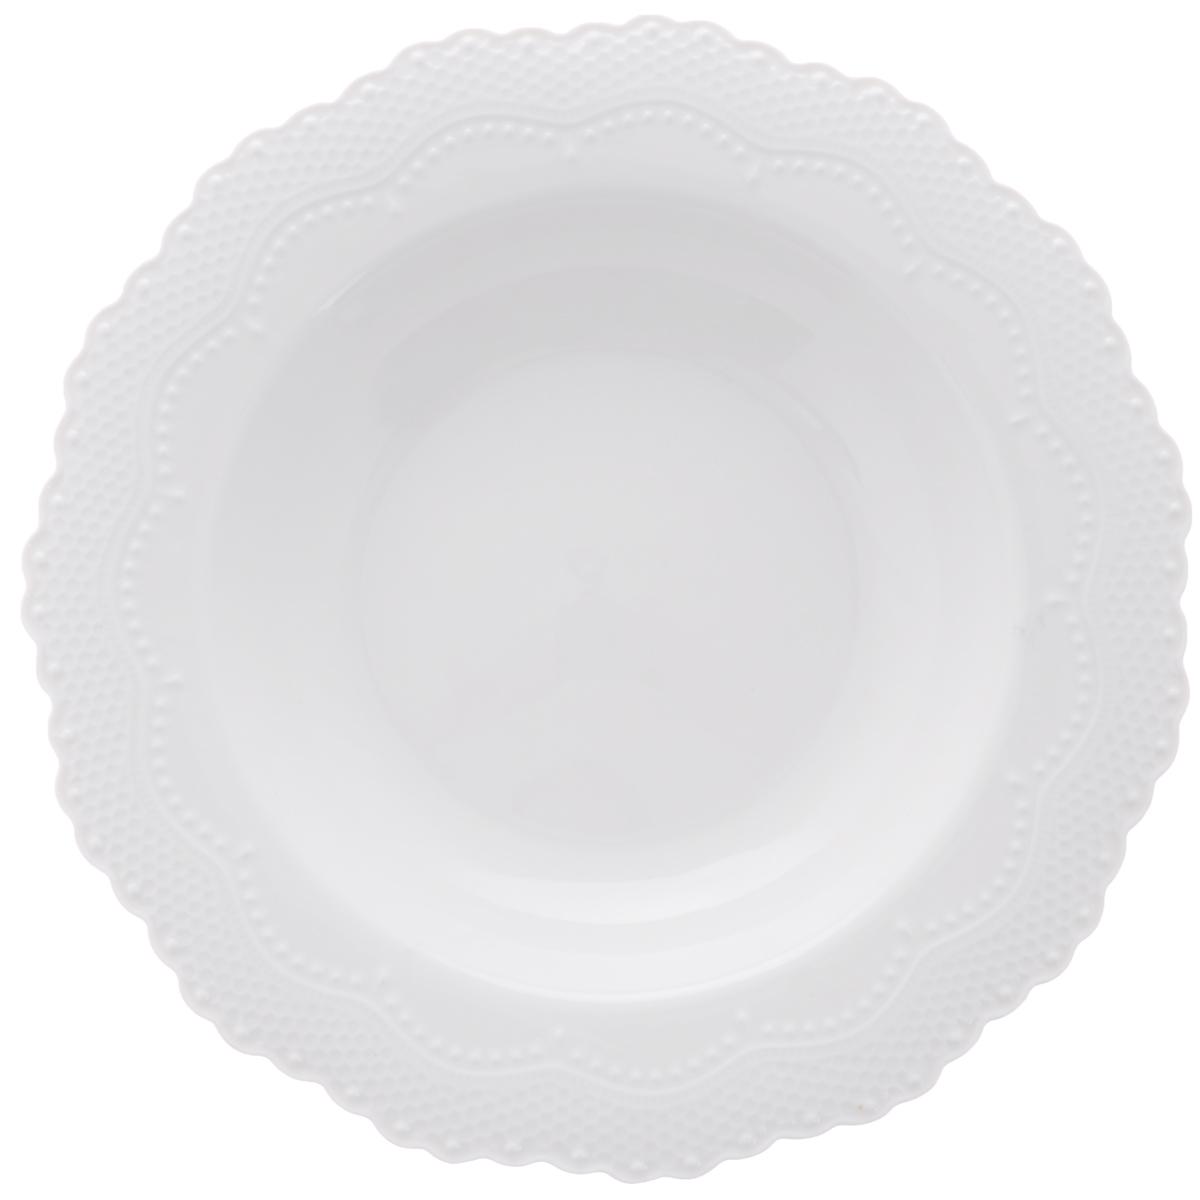 "Тарелка суповая Walmer ""Vivien"", цвет: белый, диаметр 22 см"